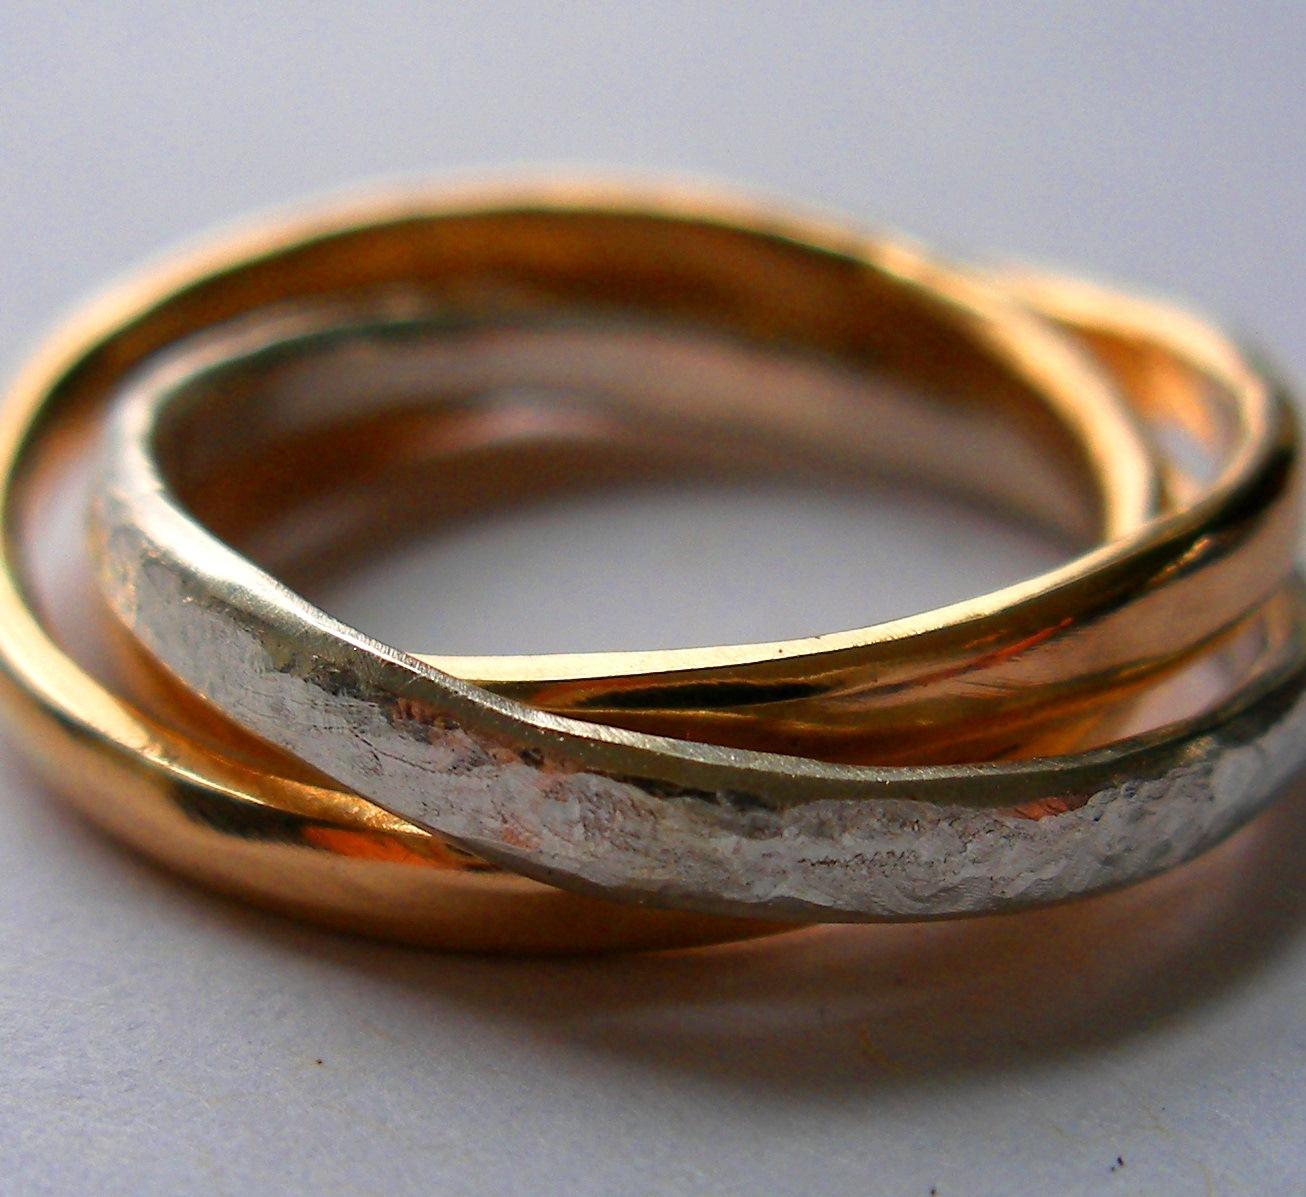 Interlocking Russian Wedding Rings Felt